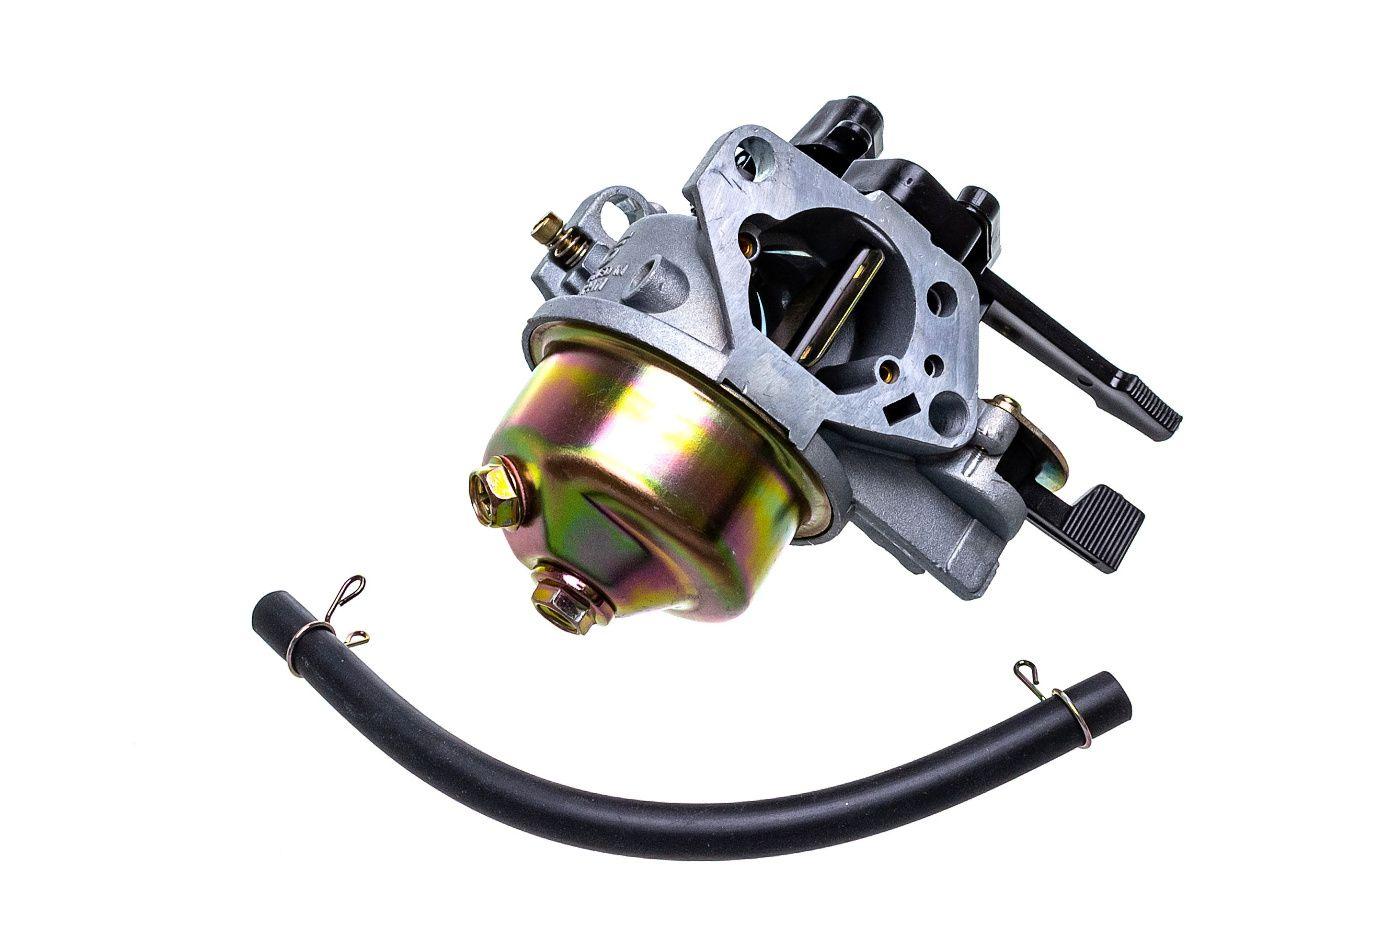 Karburátor Honda GX340 11HP, GX390 13HP, 16100-ZF6-V01 SUPER AKCE